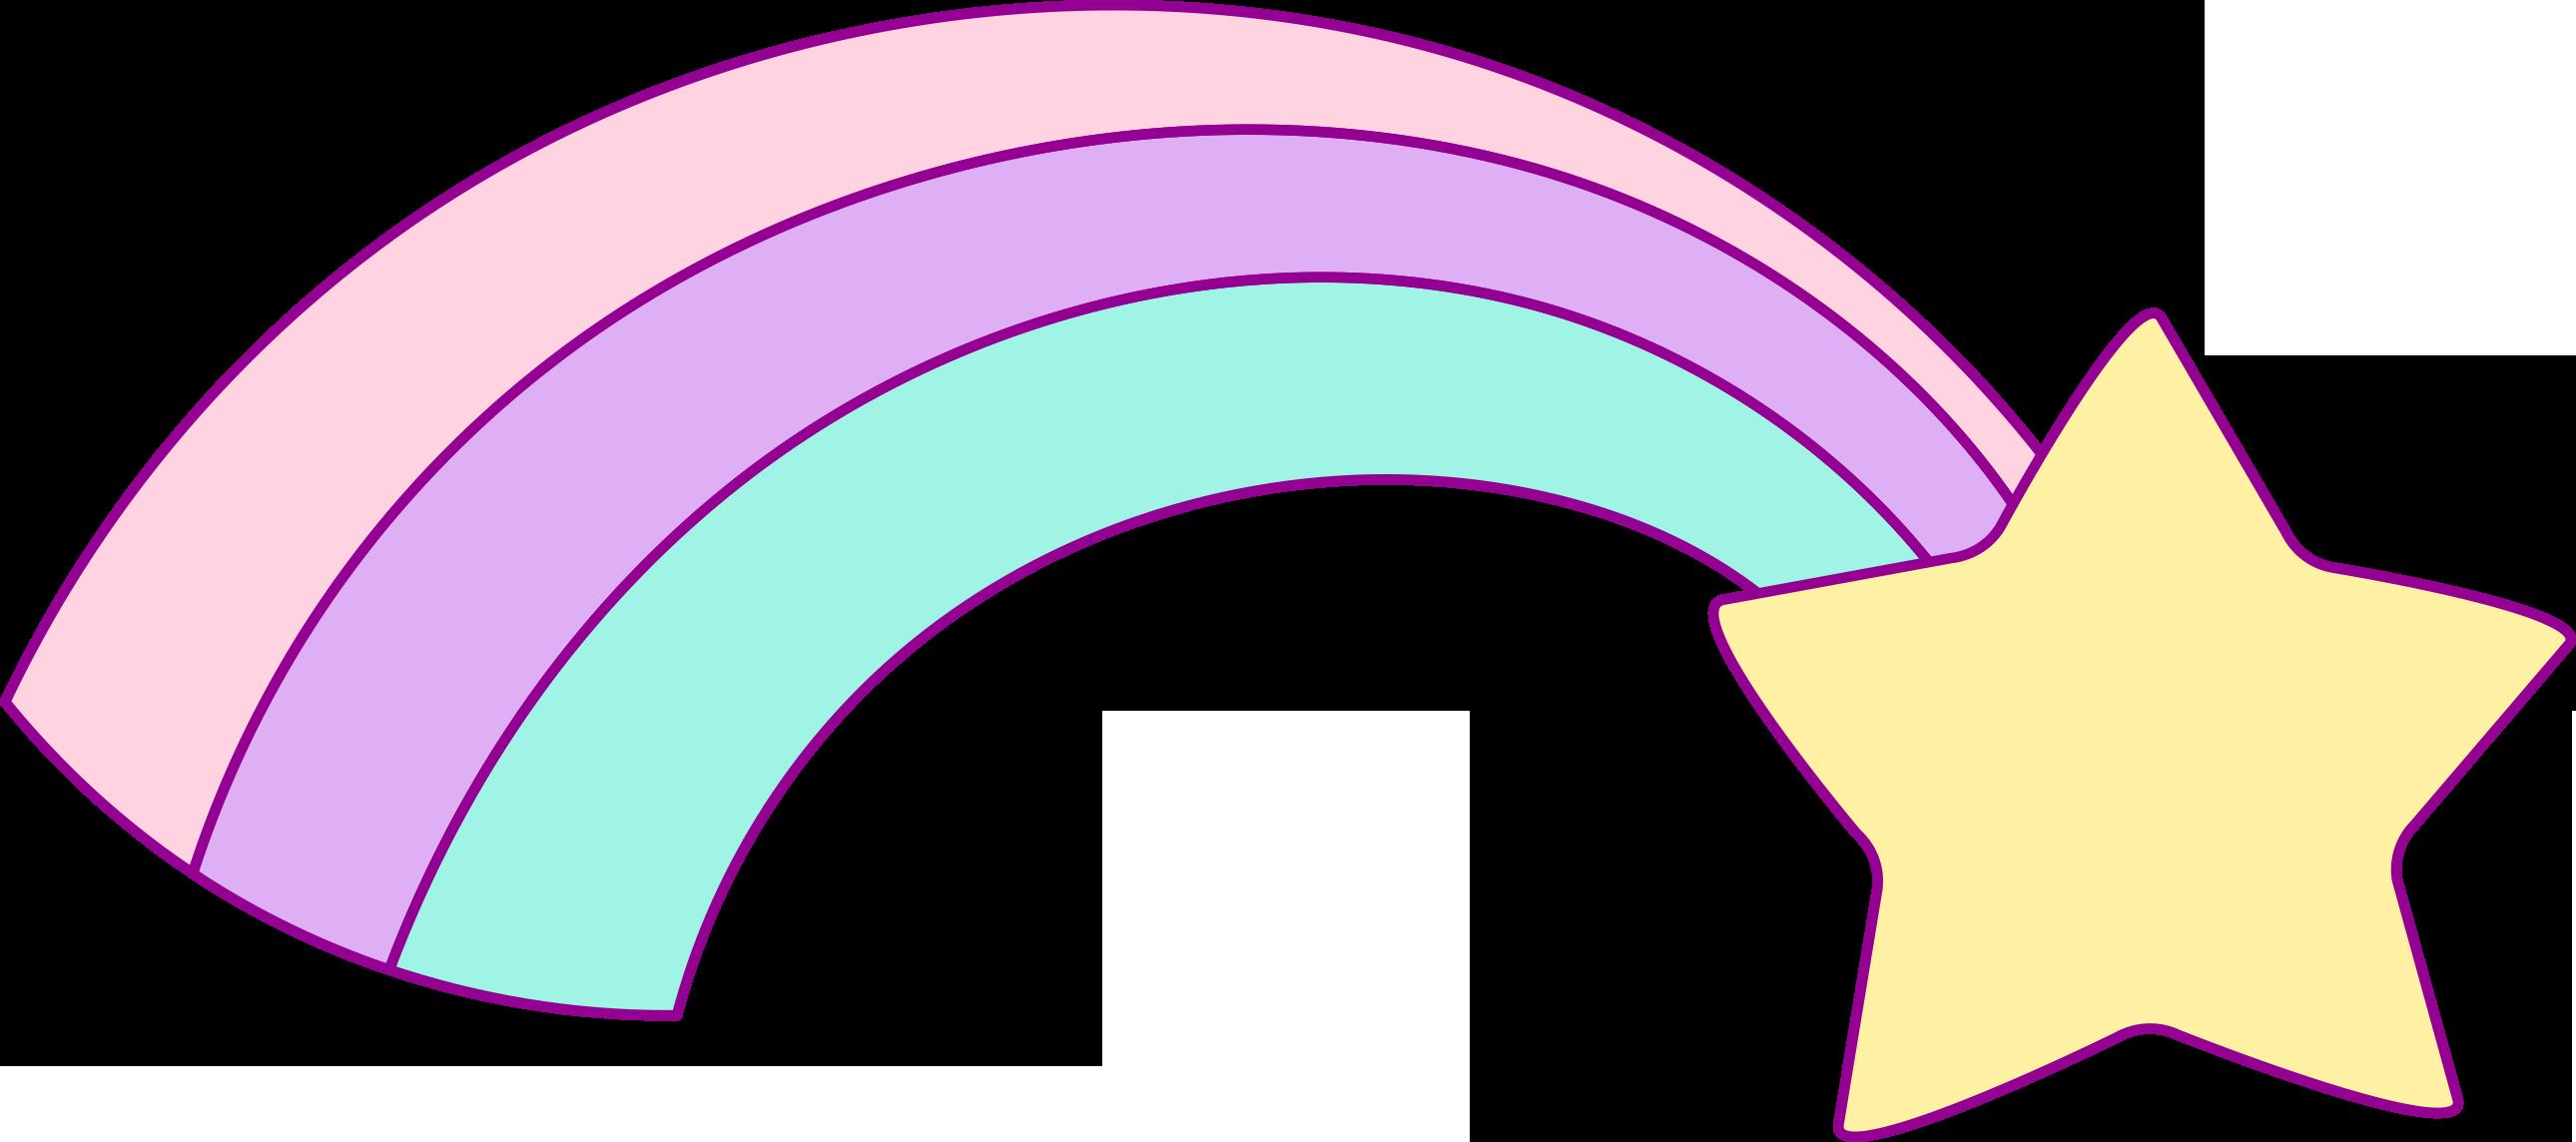 huge freebie download. Clipart unicorn shape